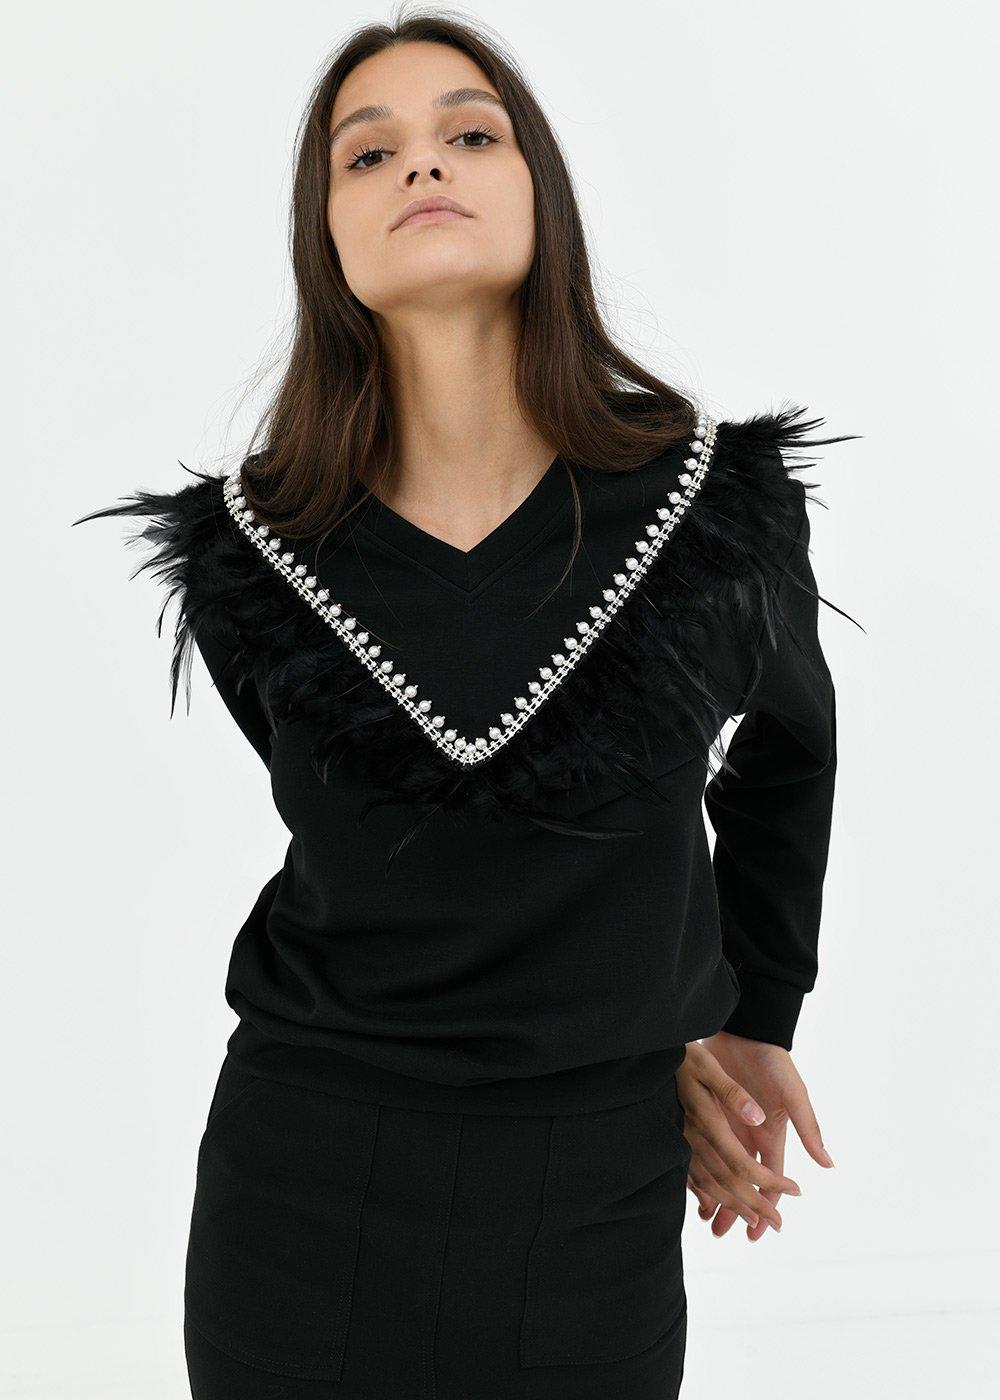 Sonya sweatshirt with feather detail - Black - Woman